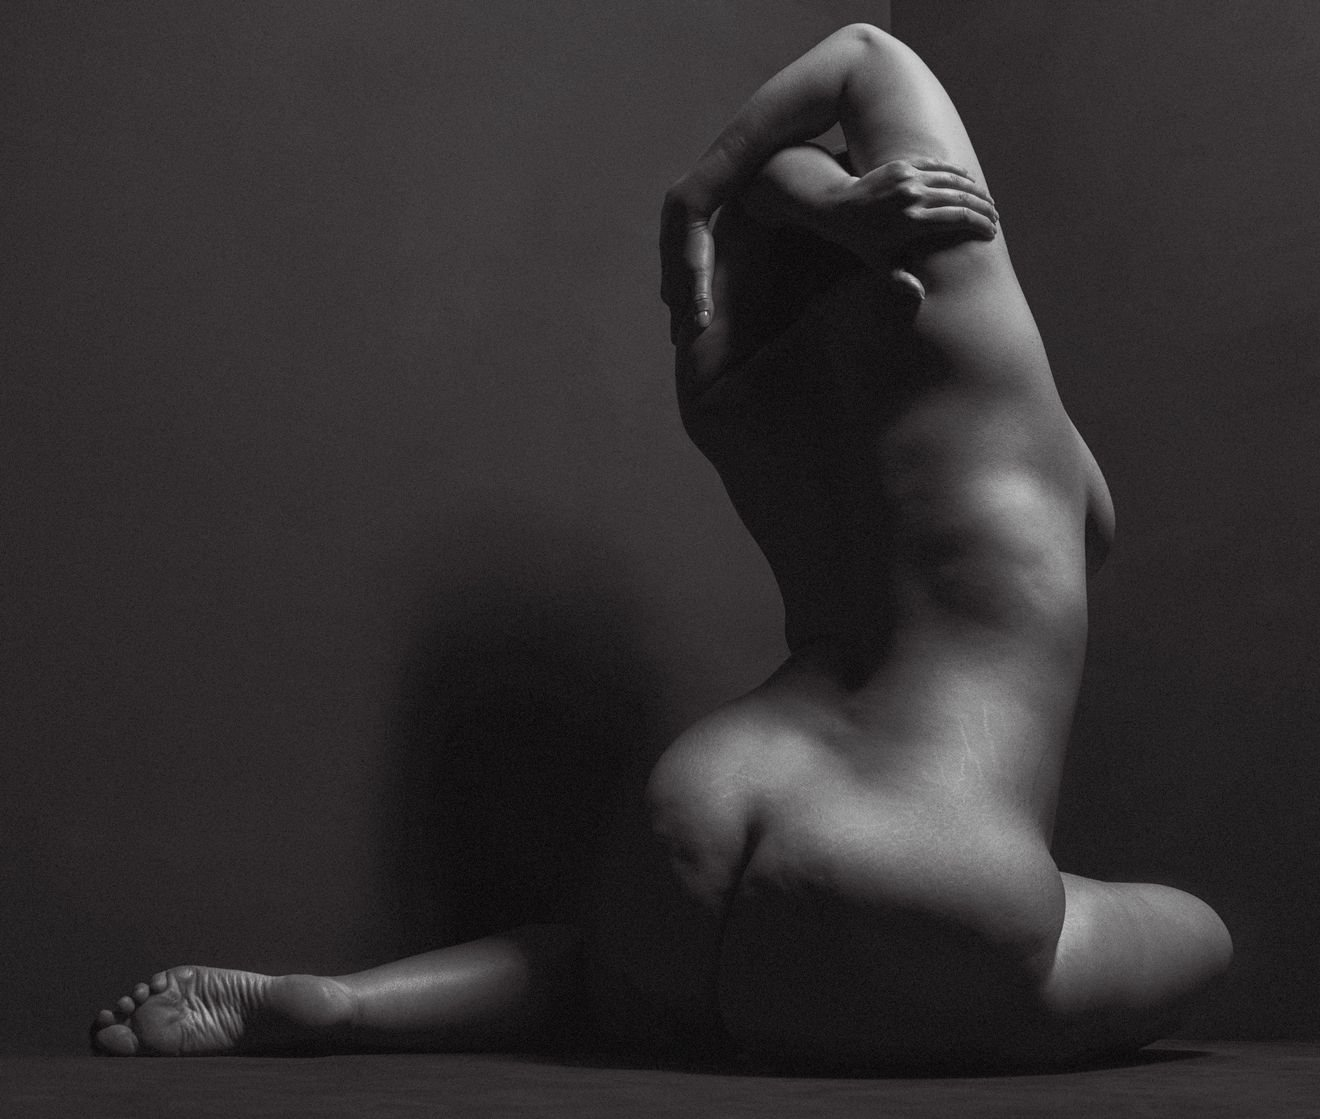 ashley graham full nude